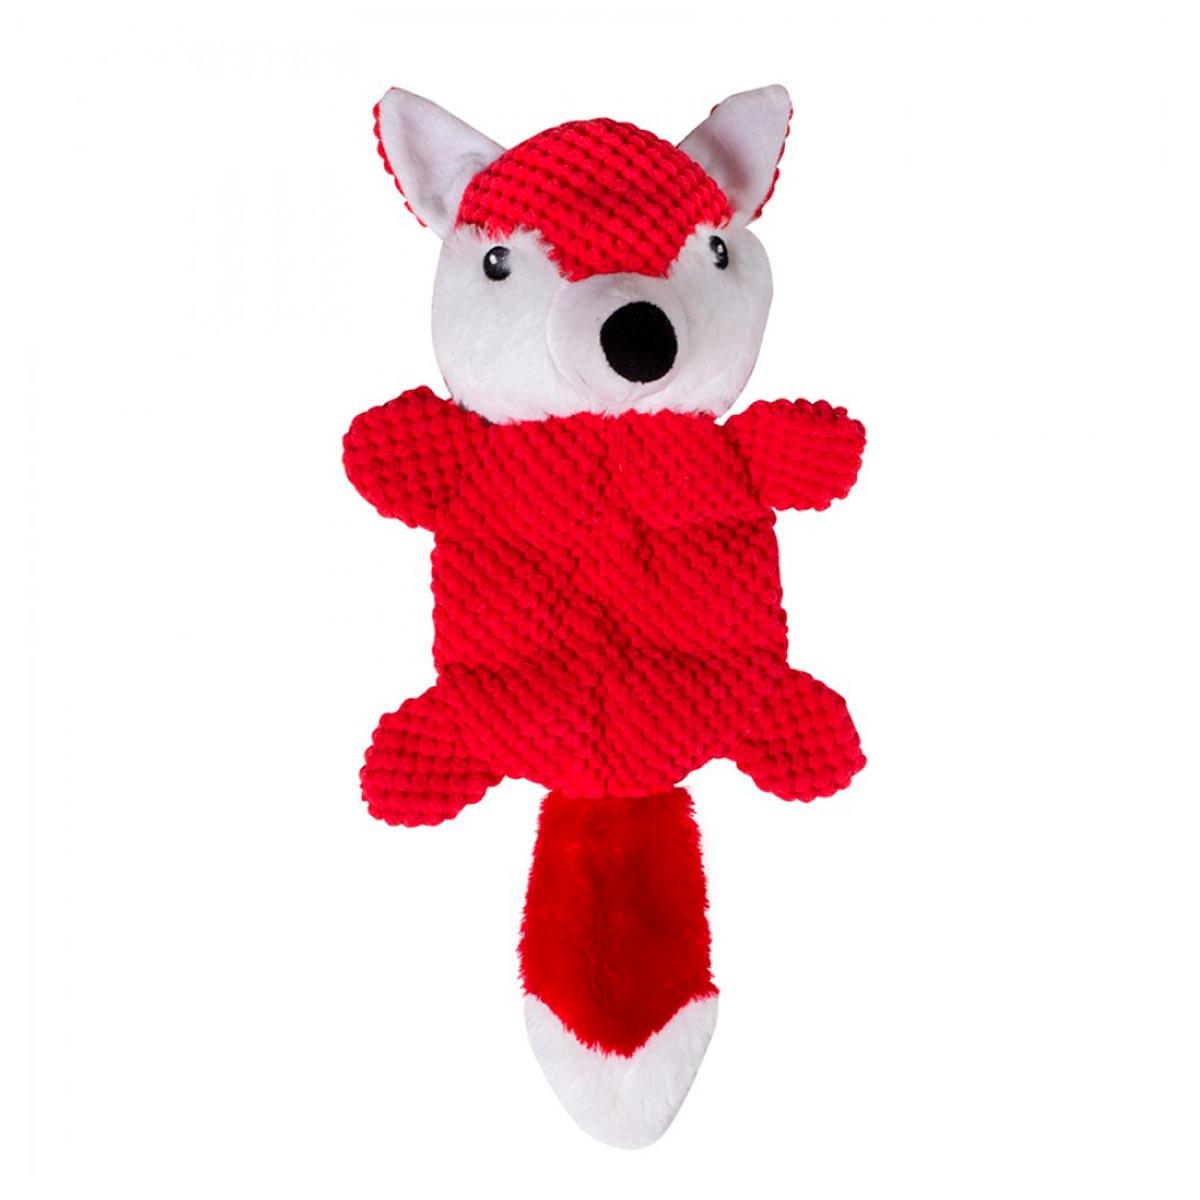 Brinquedo de Pelúcia para Cachorro Raposa Antiestresse Adoleta